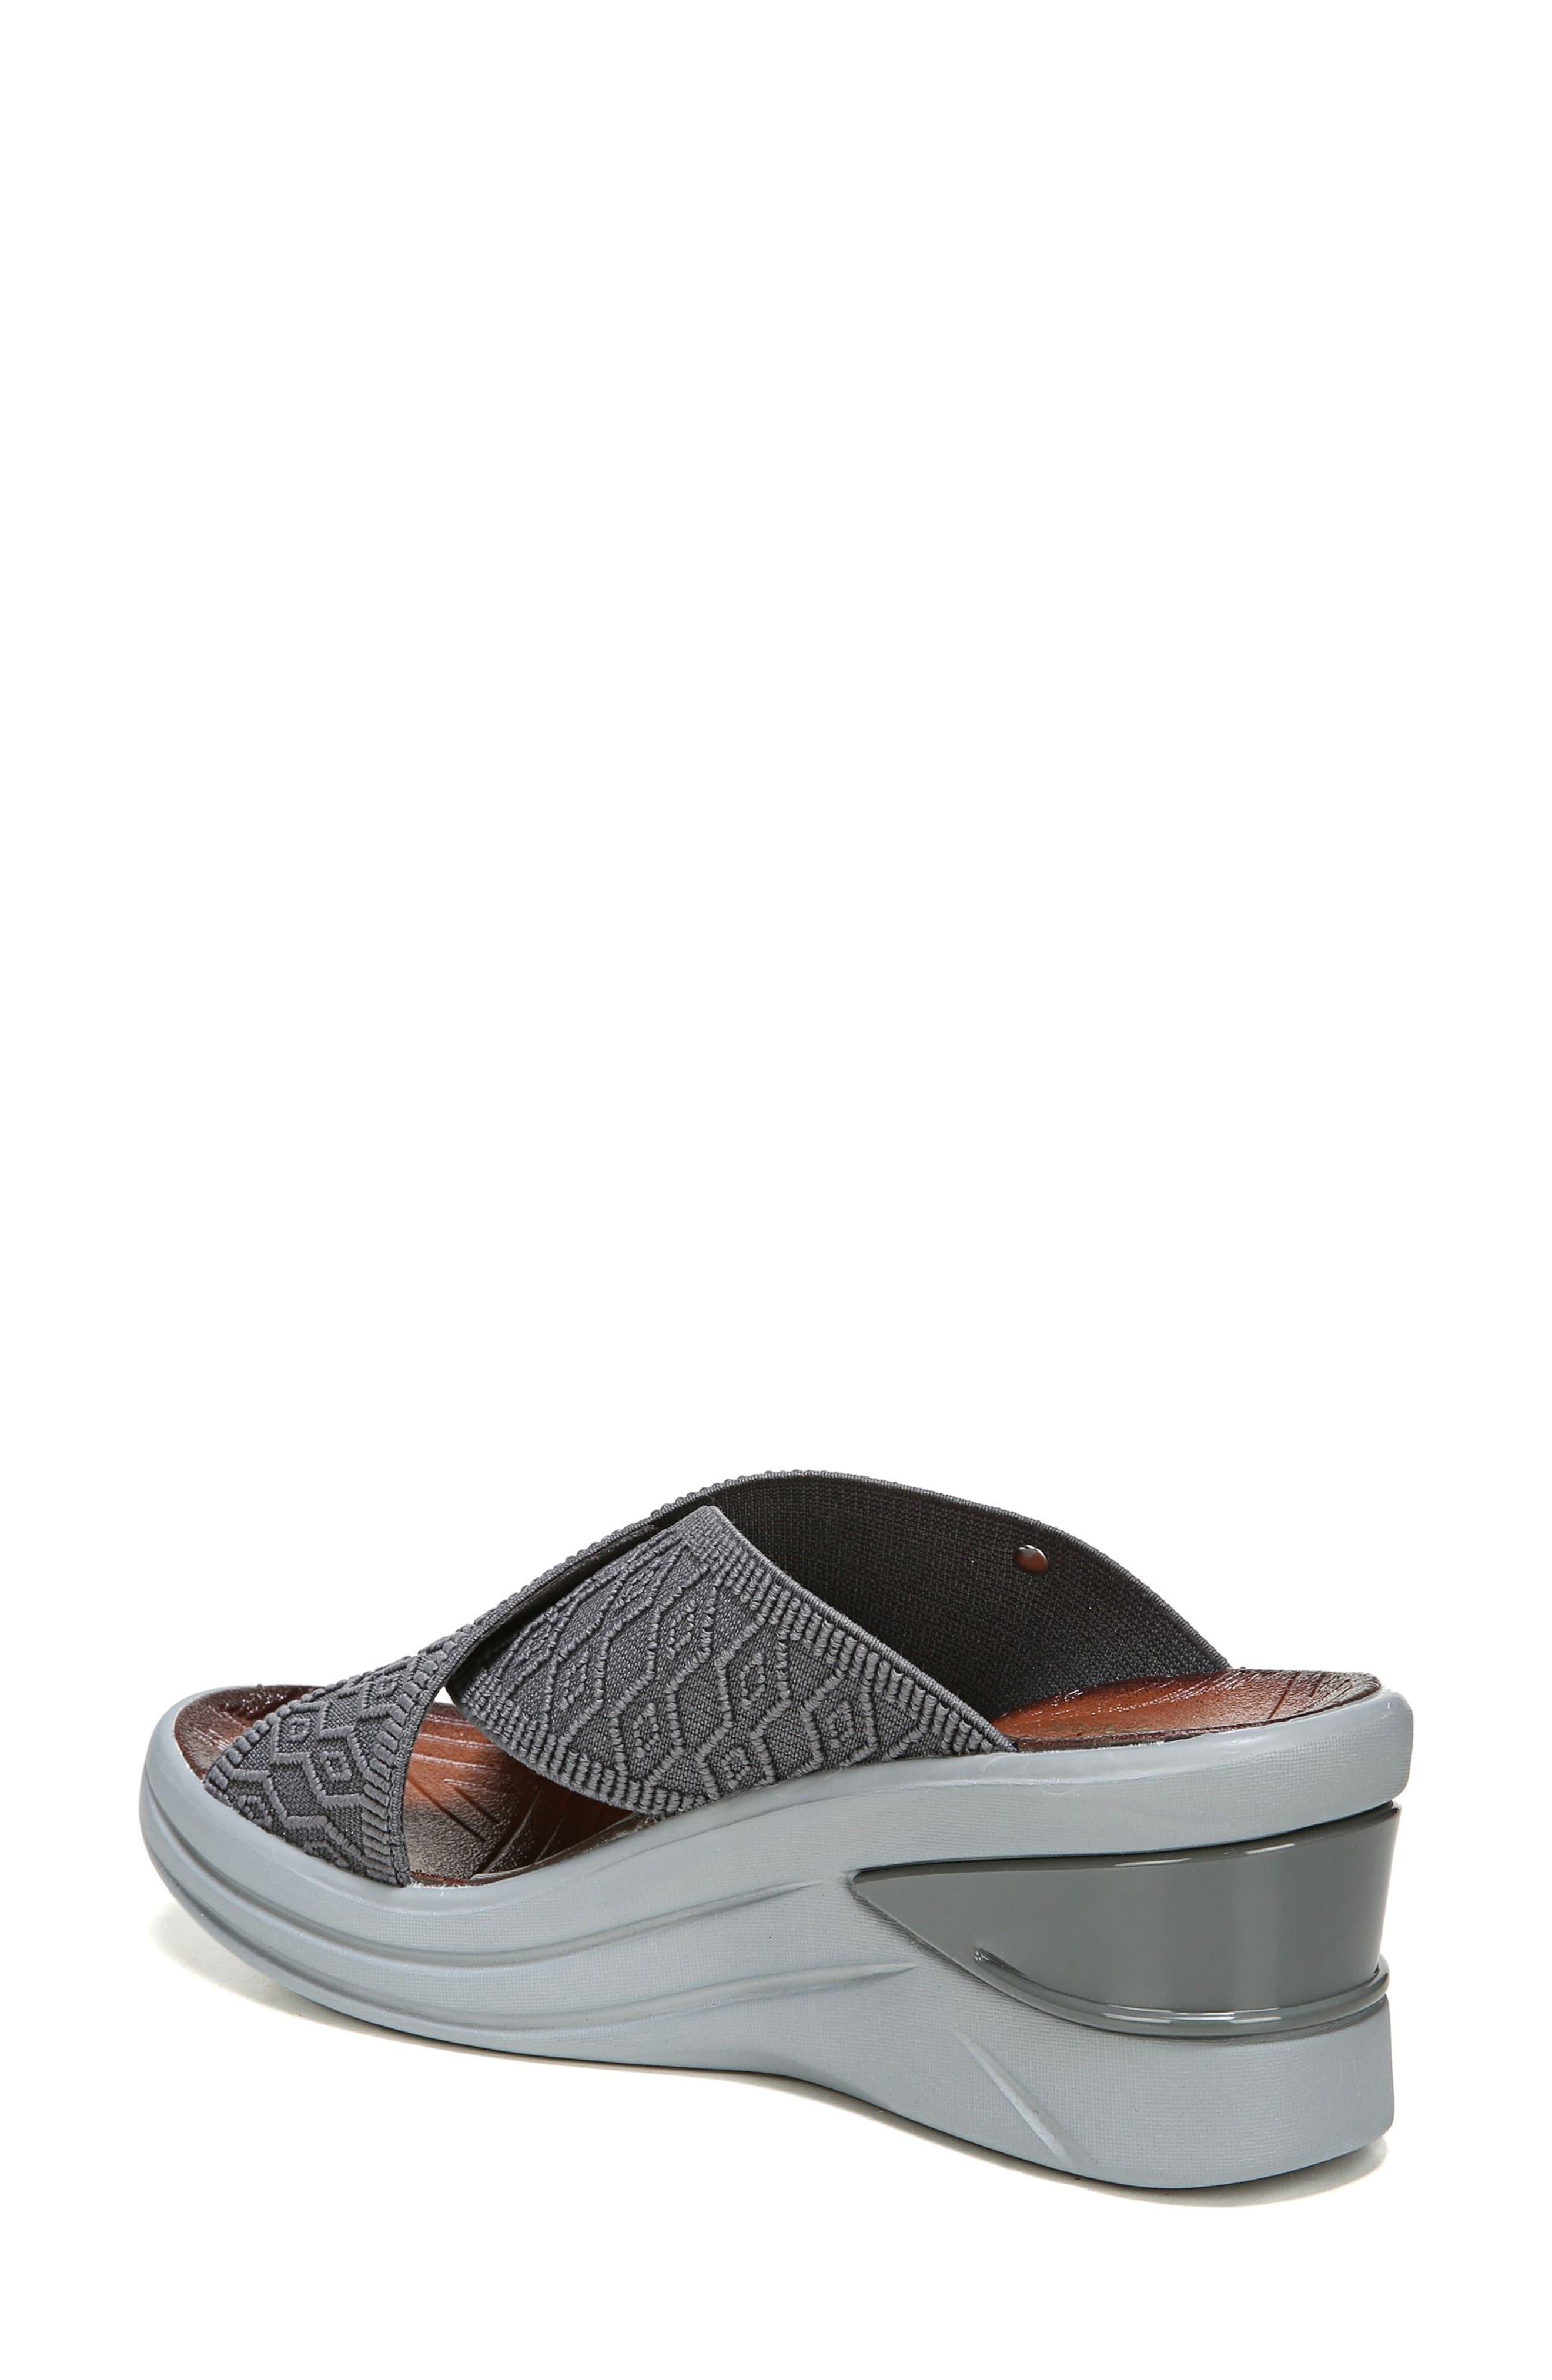 Vista Slide Sandal,                             Alternate thumbnail 2, color,                             PEWTER FABRIC